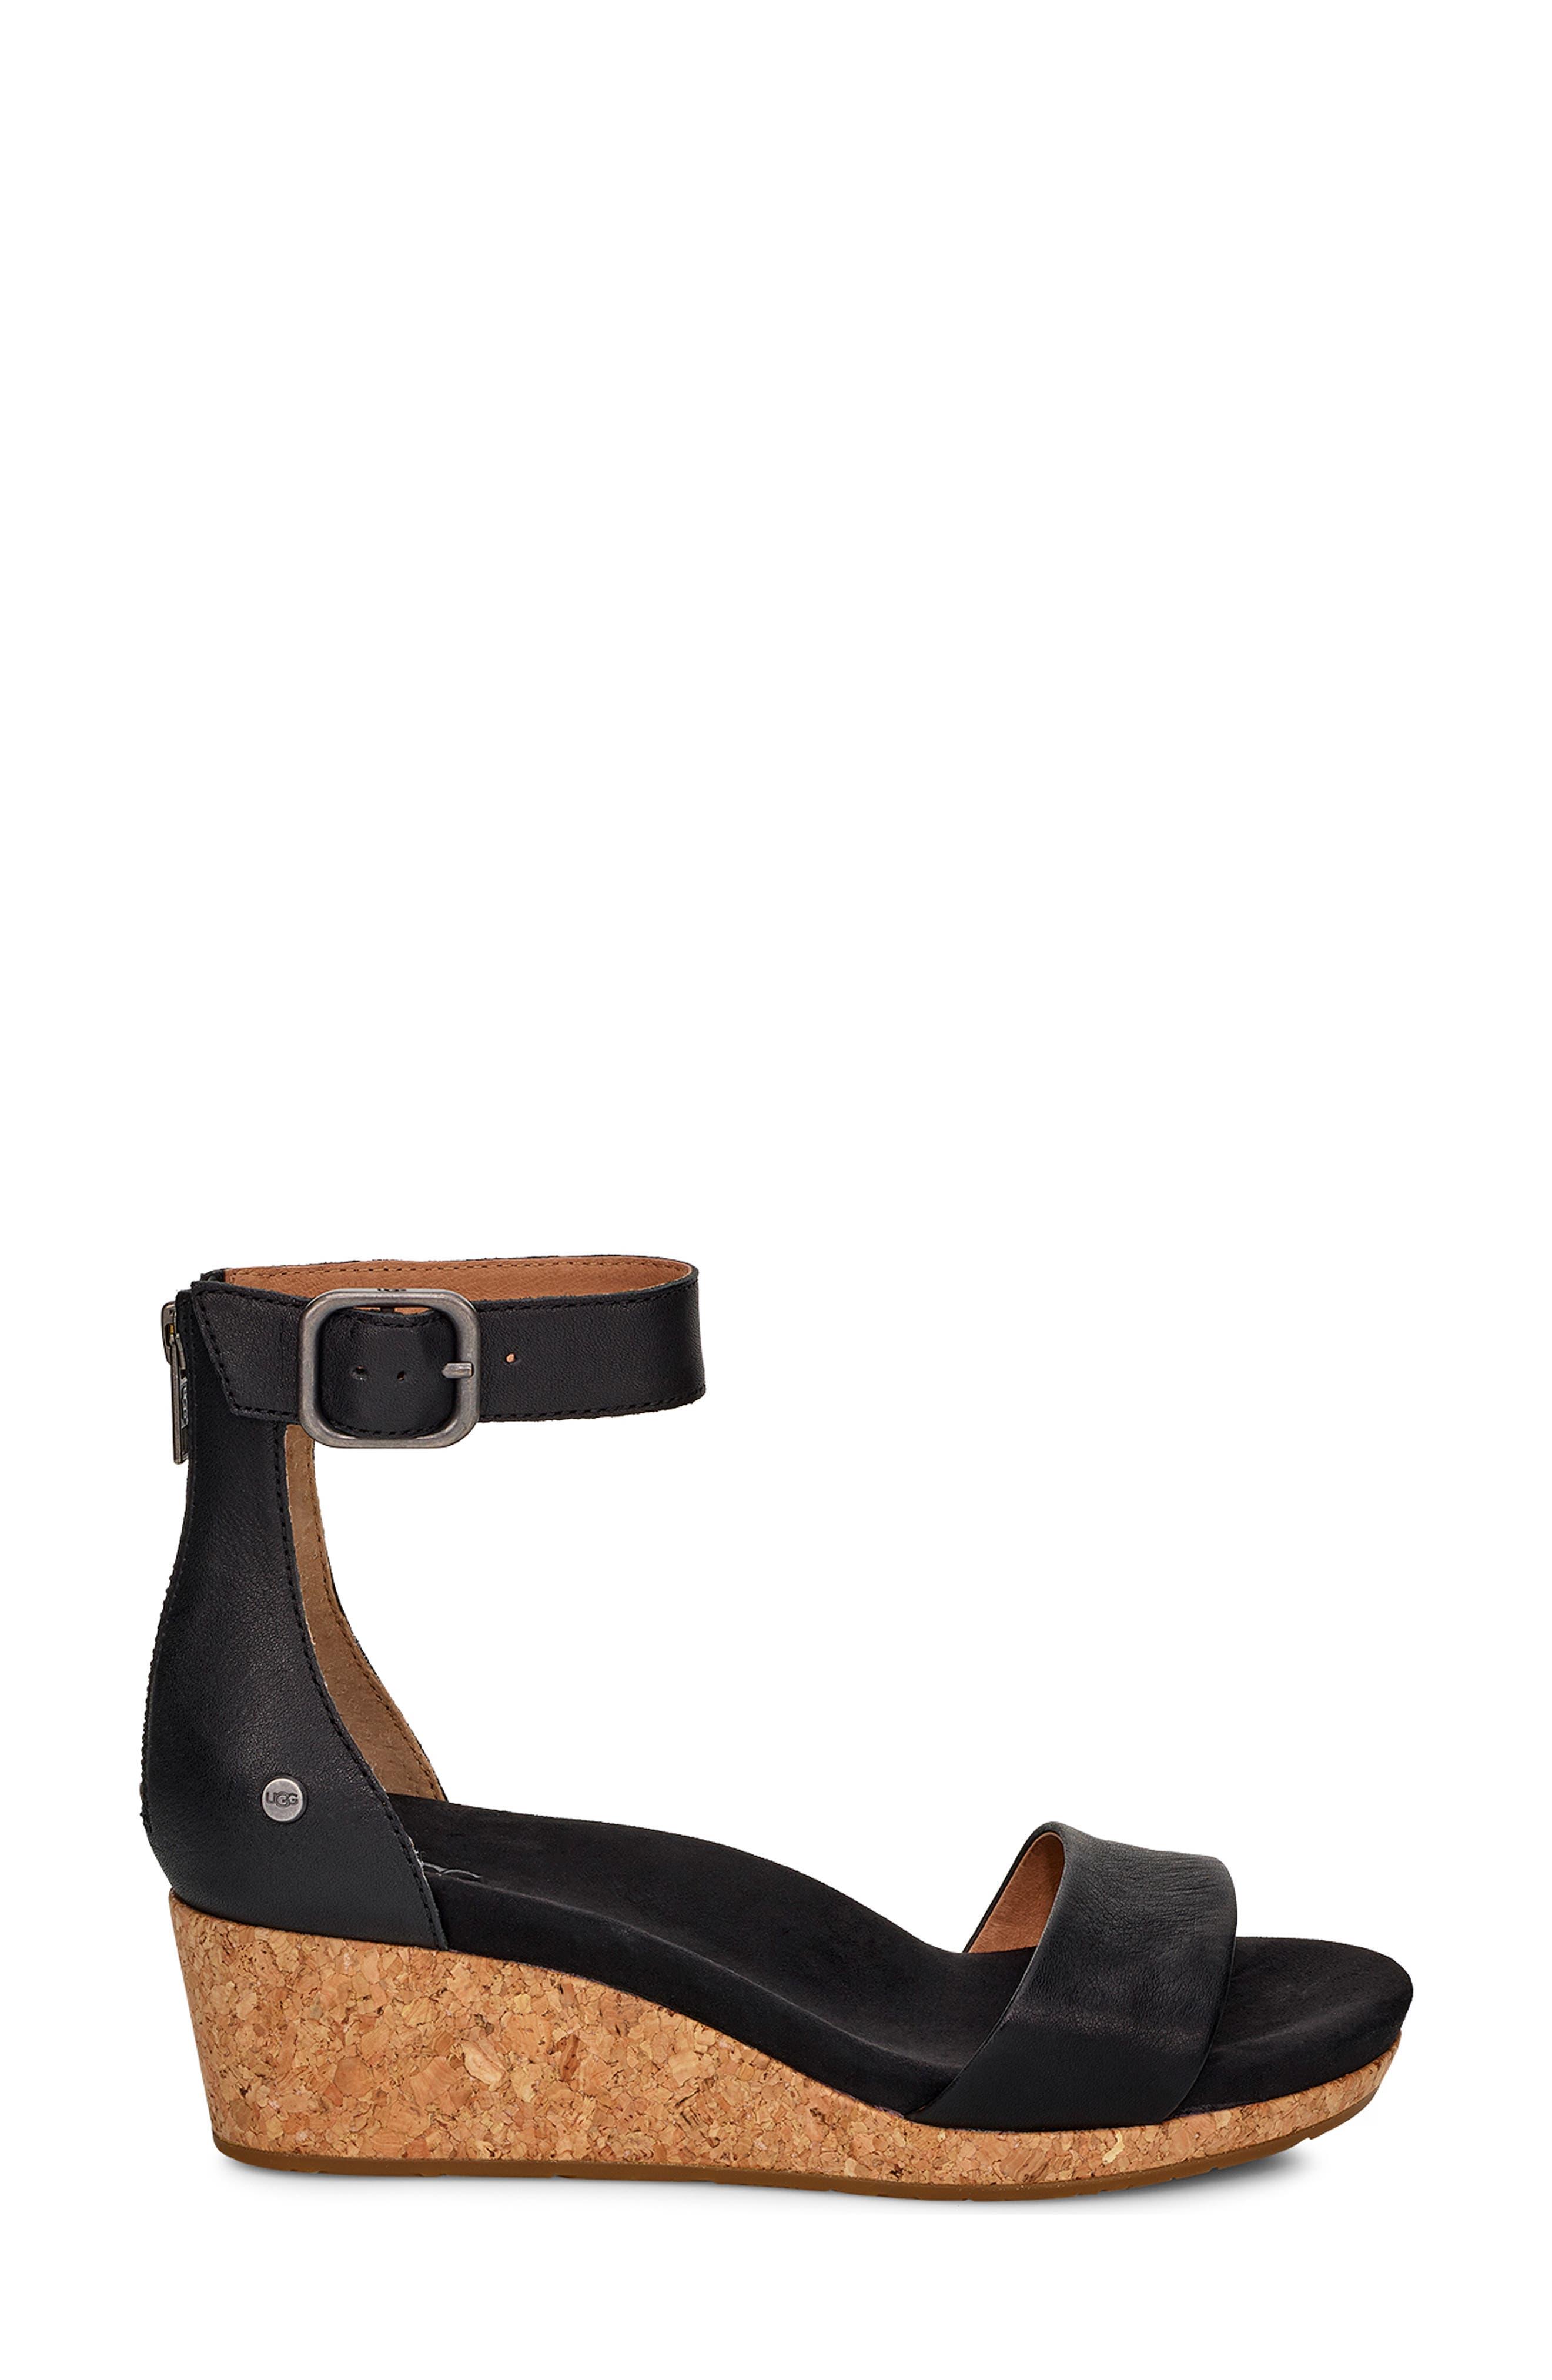 Zoe II Wedge Sandal,                             Alternate thumbnail 3, color,                             BLACK LEATHER